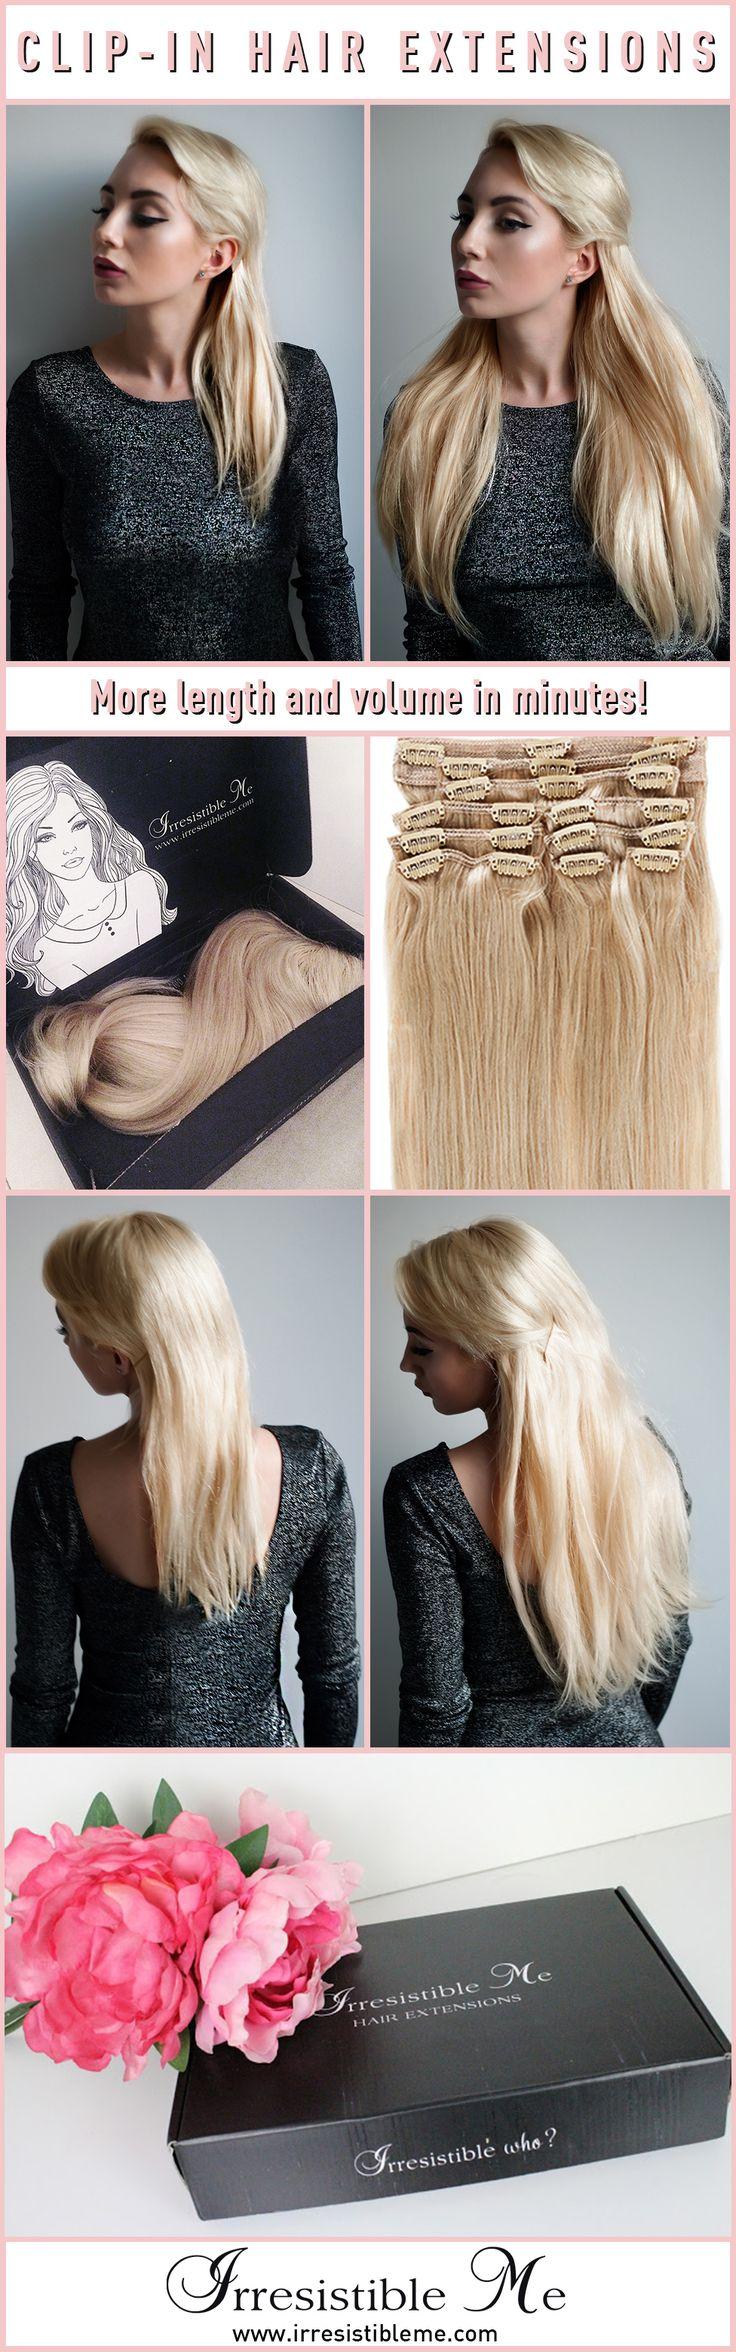 best hair ideas images on pinterest